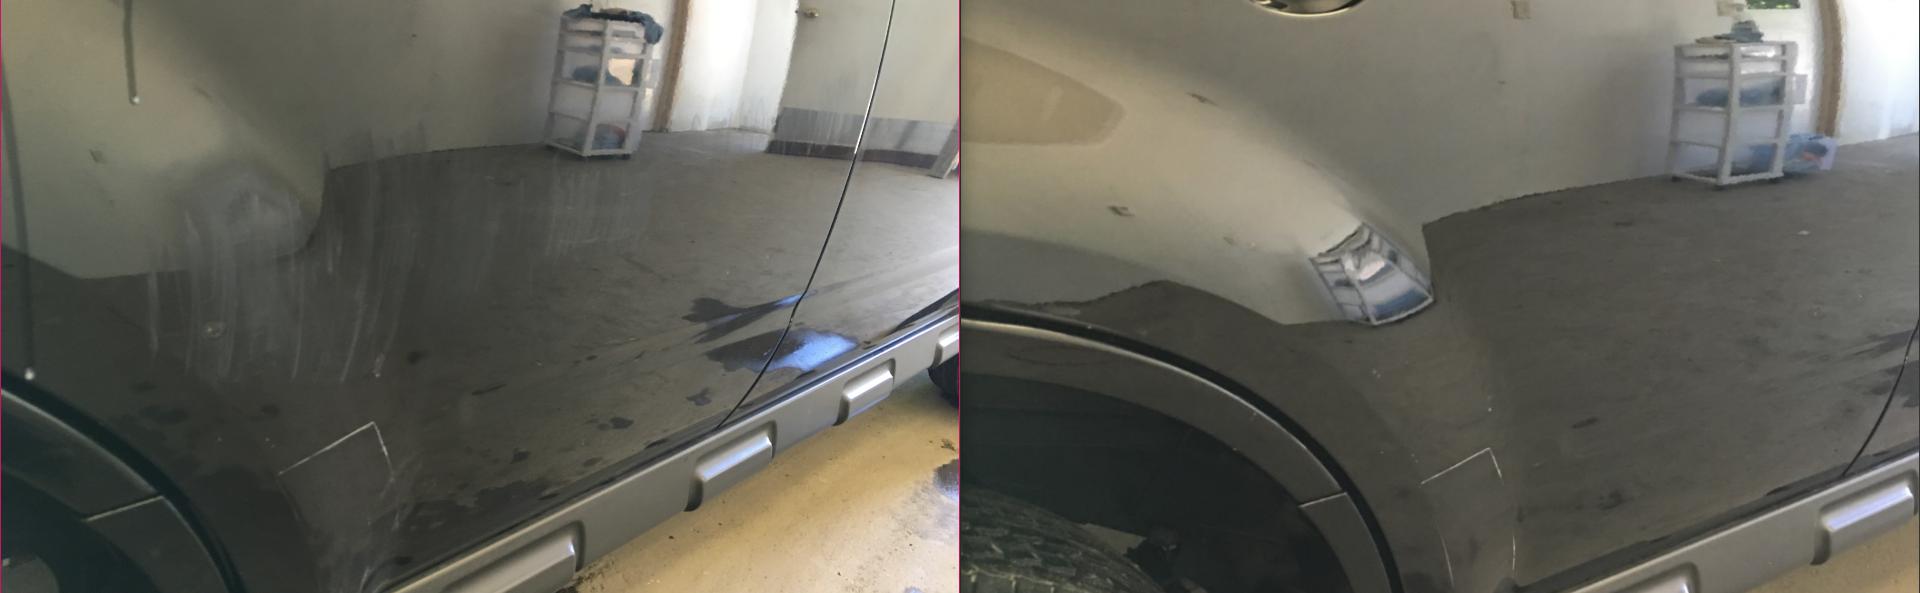 Ford Escape Scratch Removal